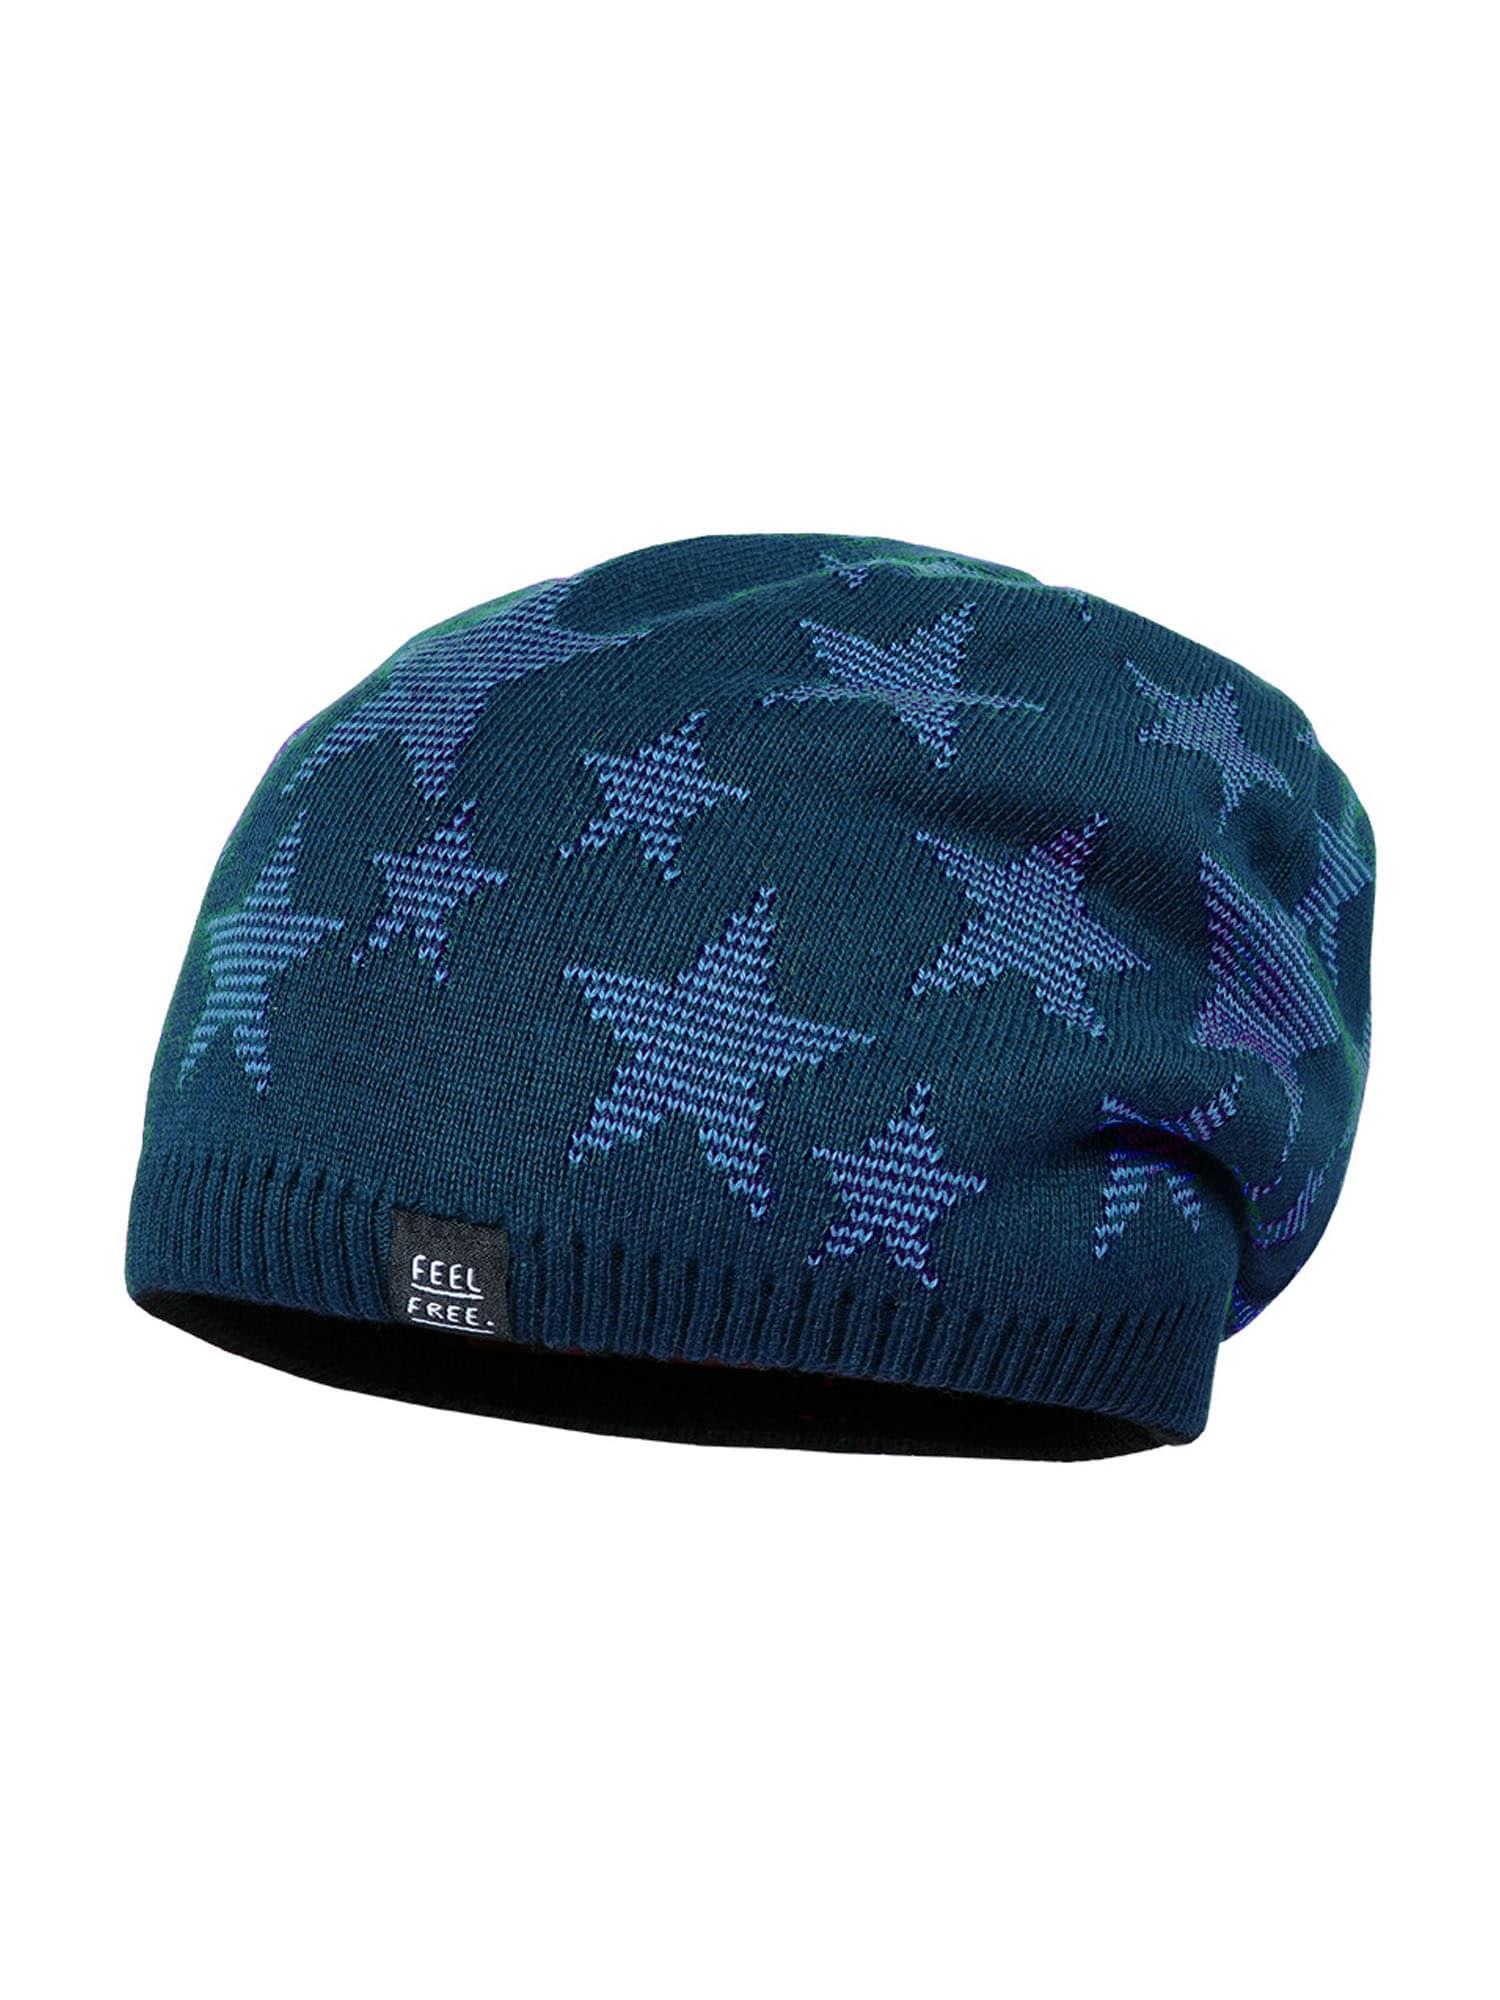 MAXIMO Megzta kepurė mėlyna / tamsiai pilka / dangaus žydra